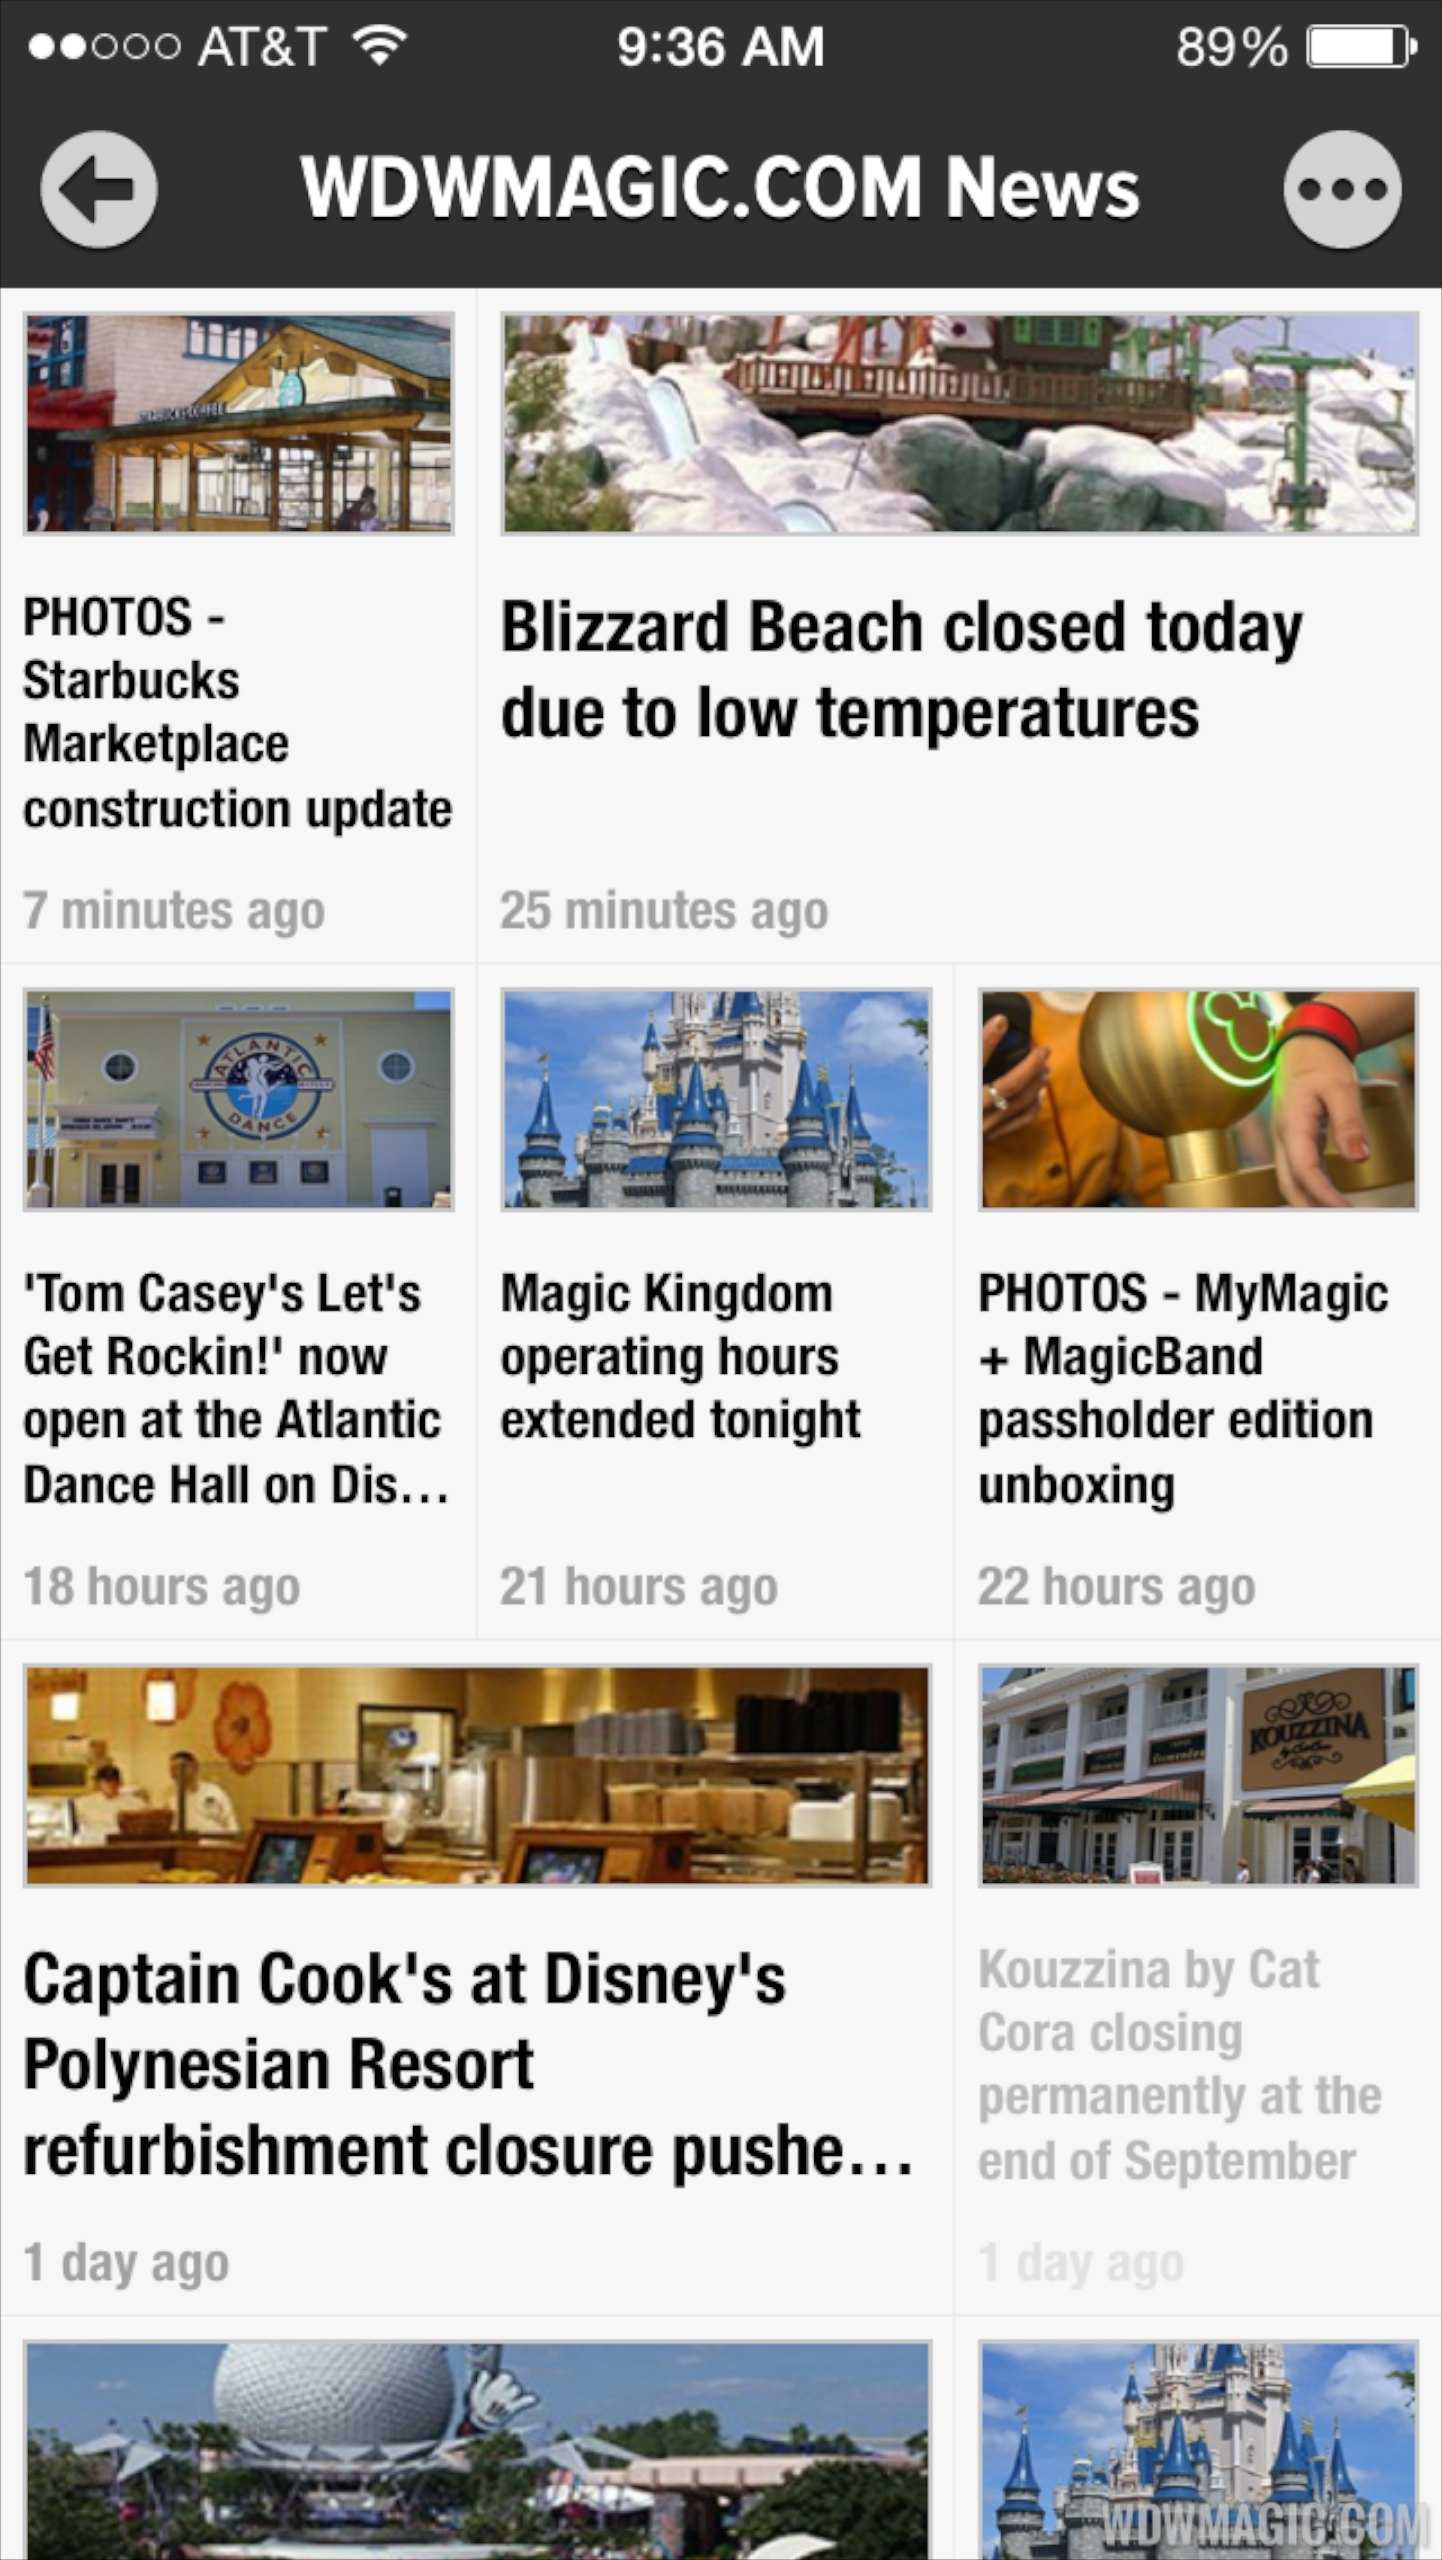 WDWMAGIC on Newsify via RSS